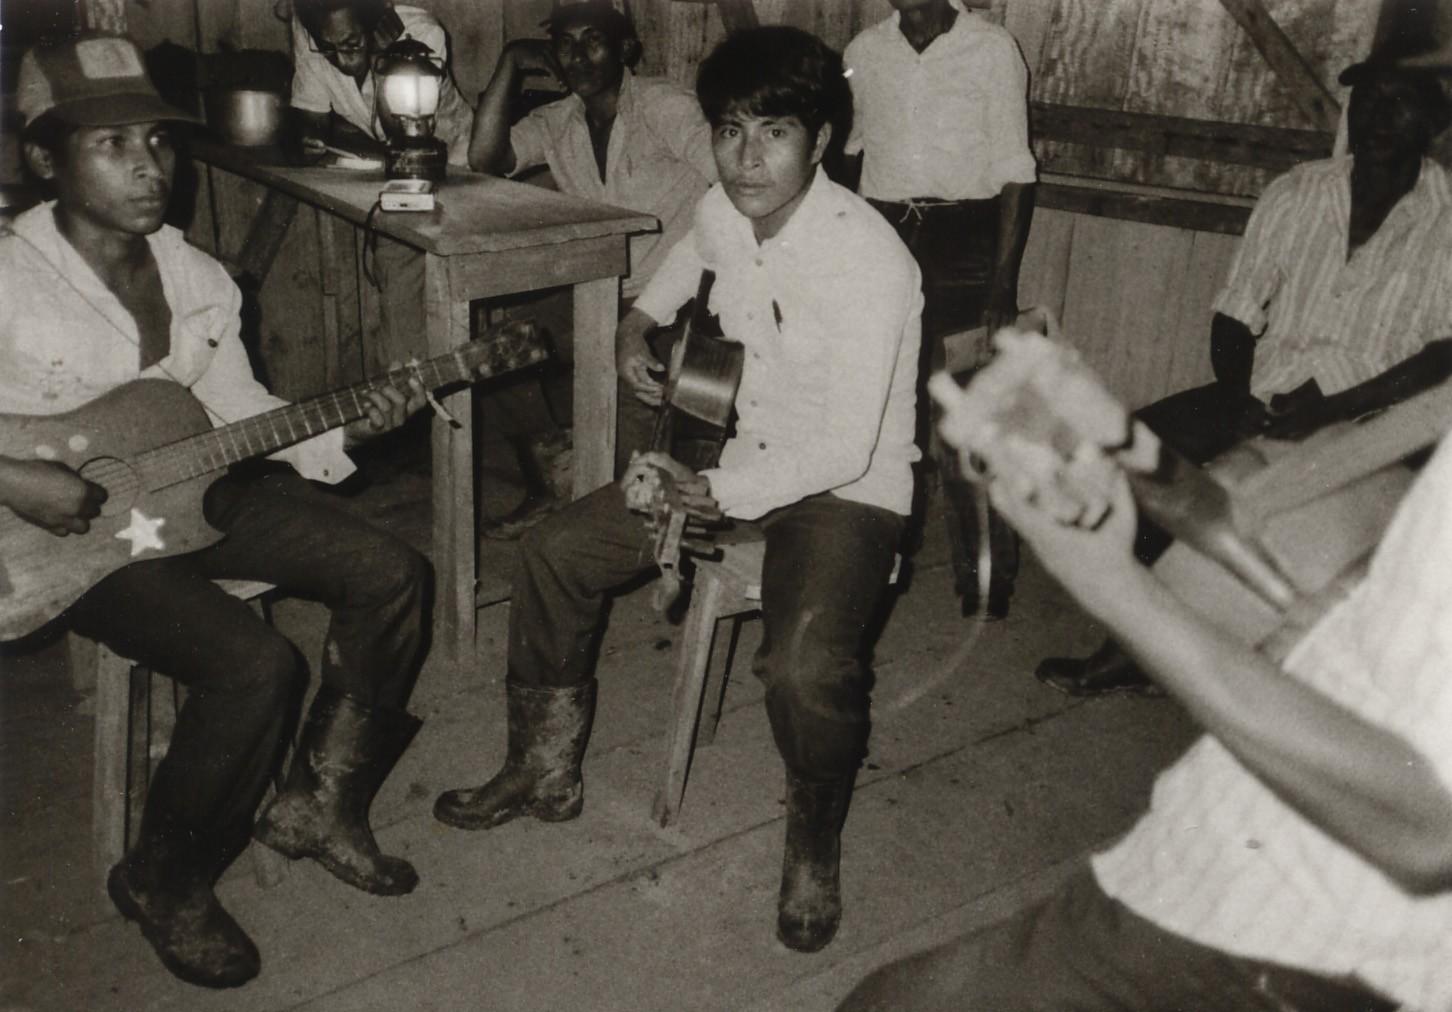 Three Mayangna musicians during sound recordings, Nicaragua, around 1980 (Museum Schloss Lübben, CC BY-NC-SA)